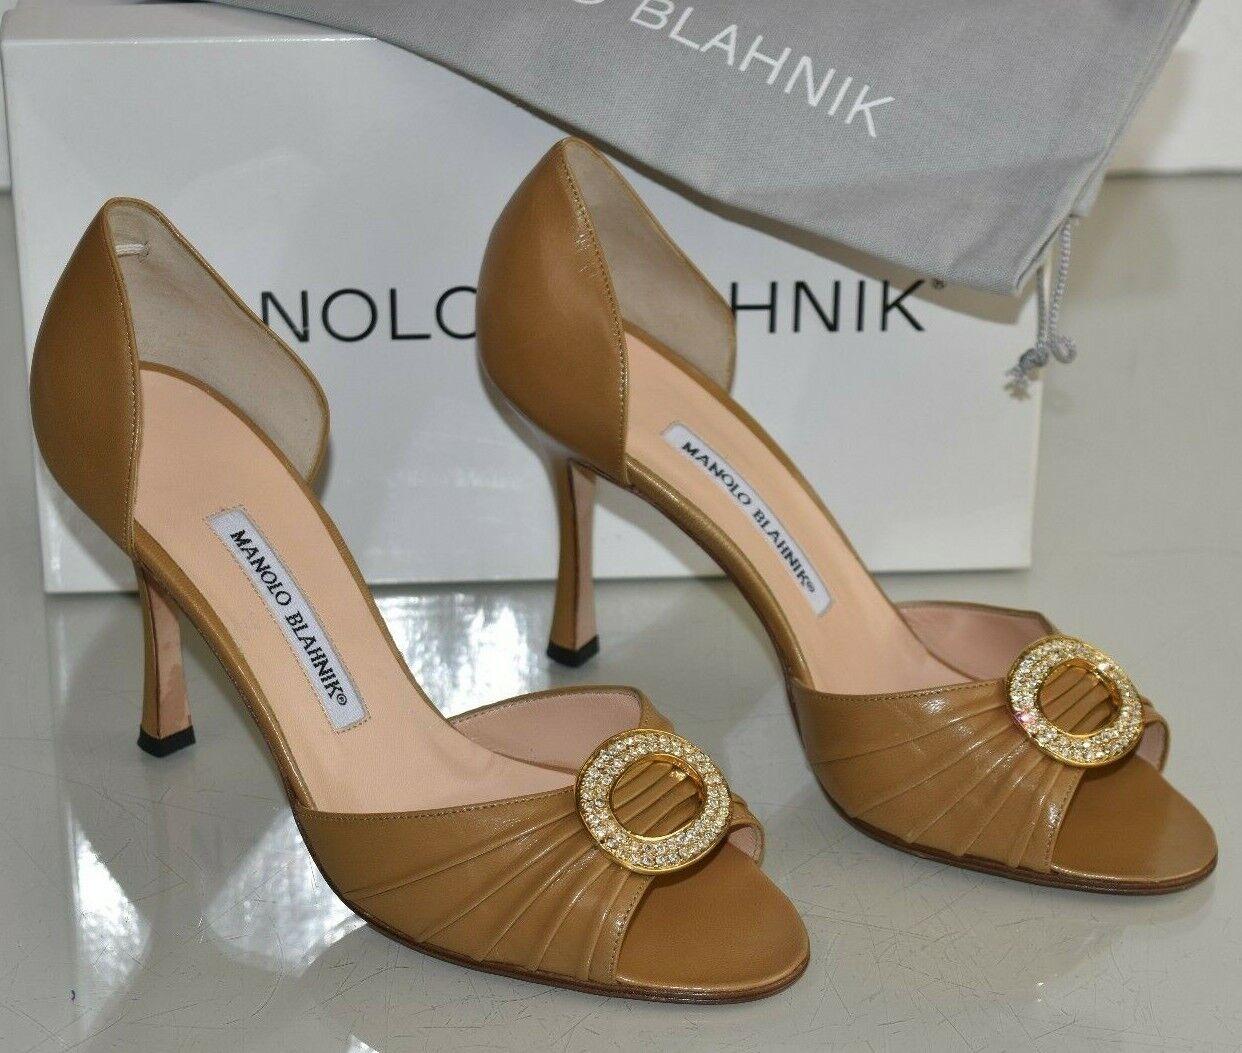 775 New MANOLO BLAHNIK SEDARABY beige camel leather gold jeweled SHOES 38.5